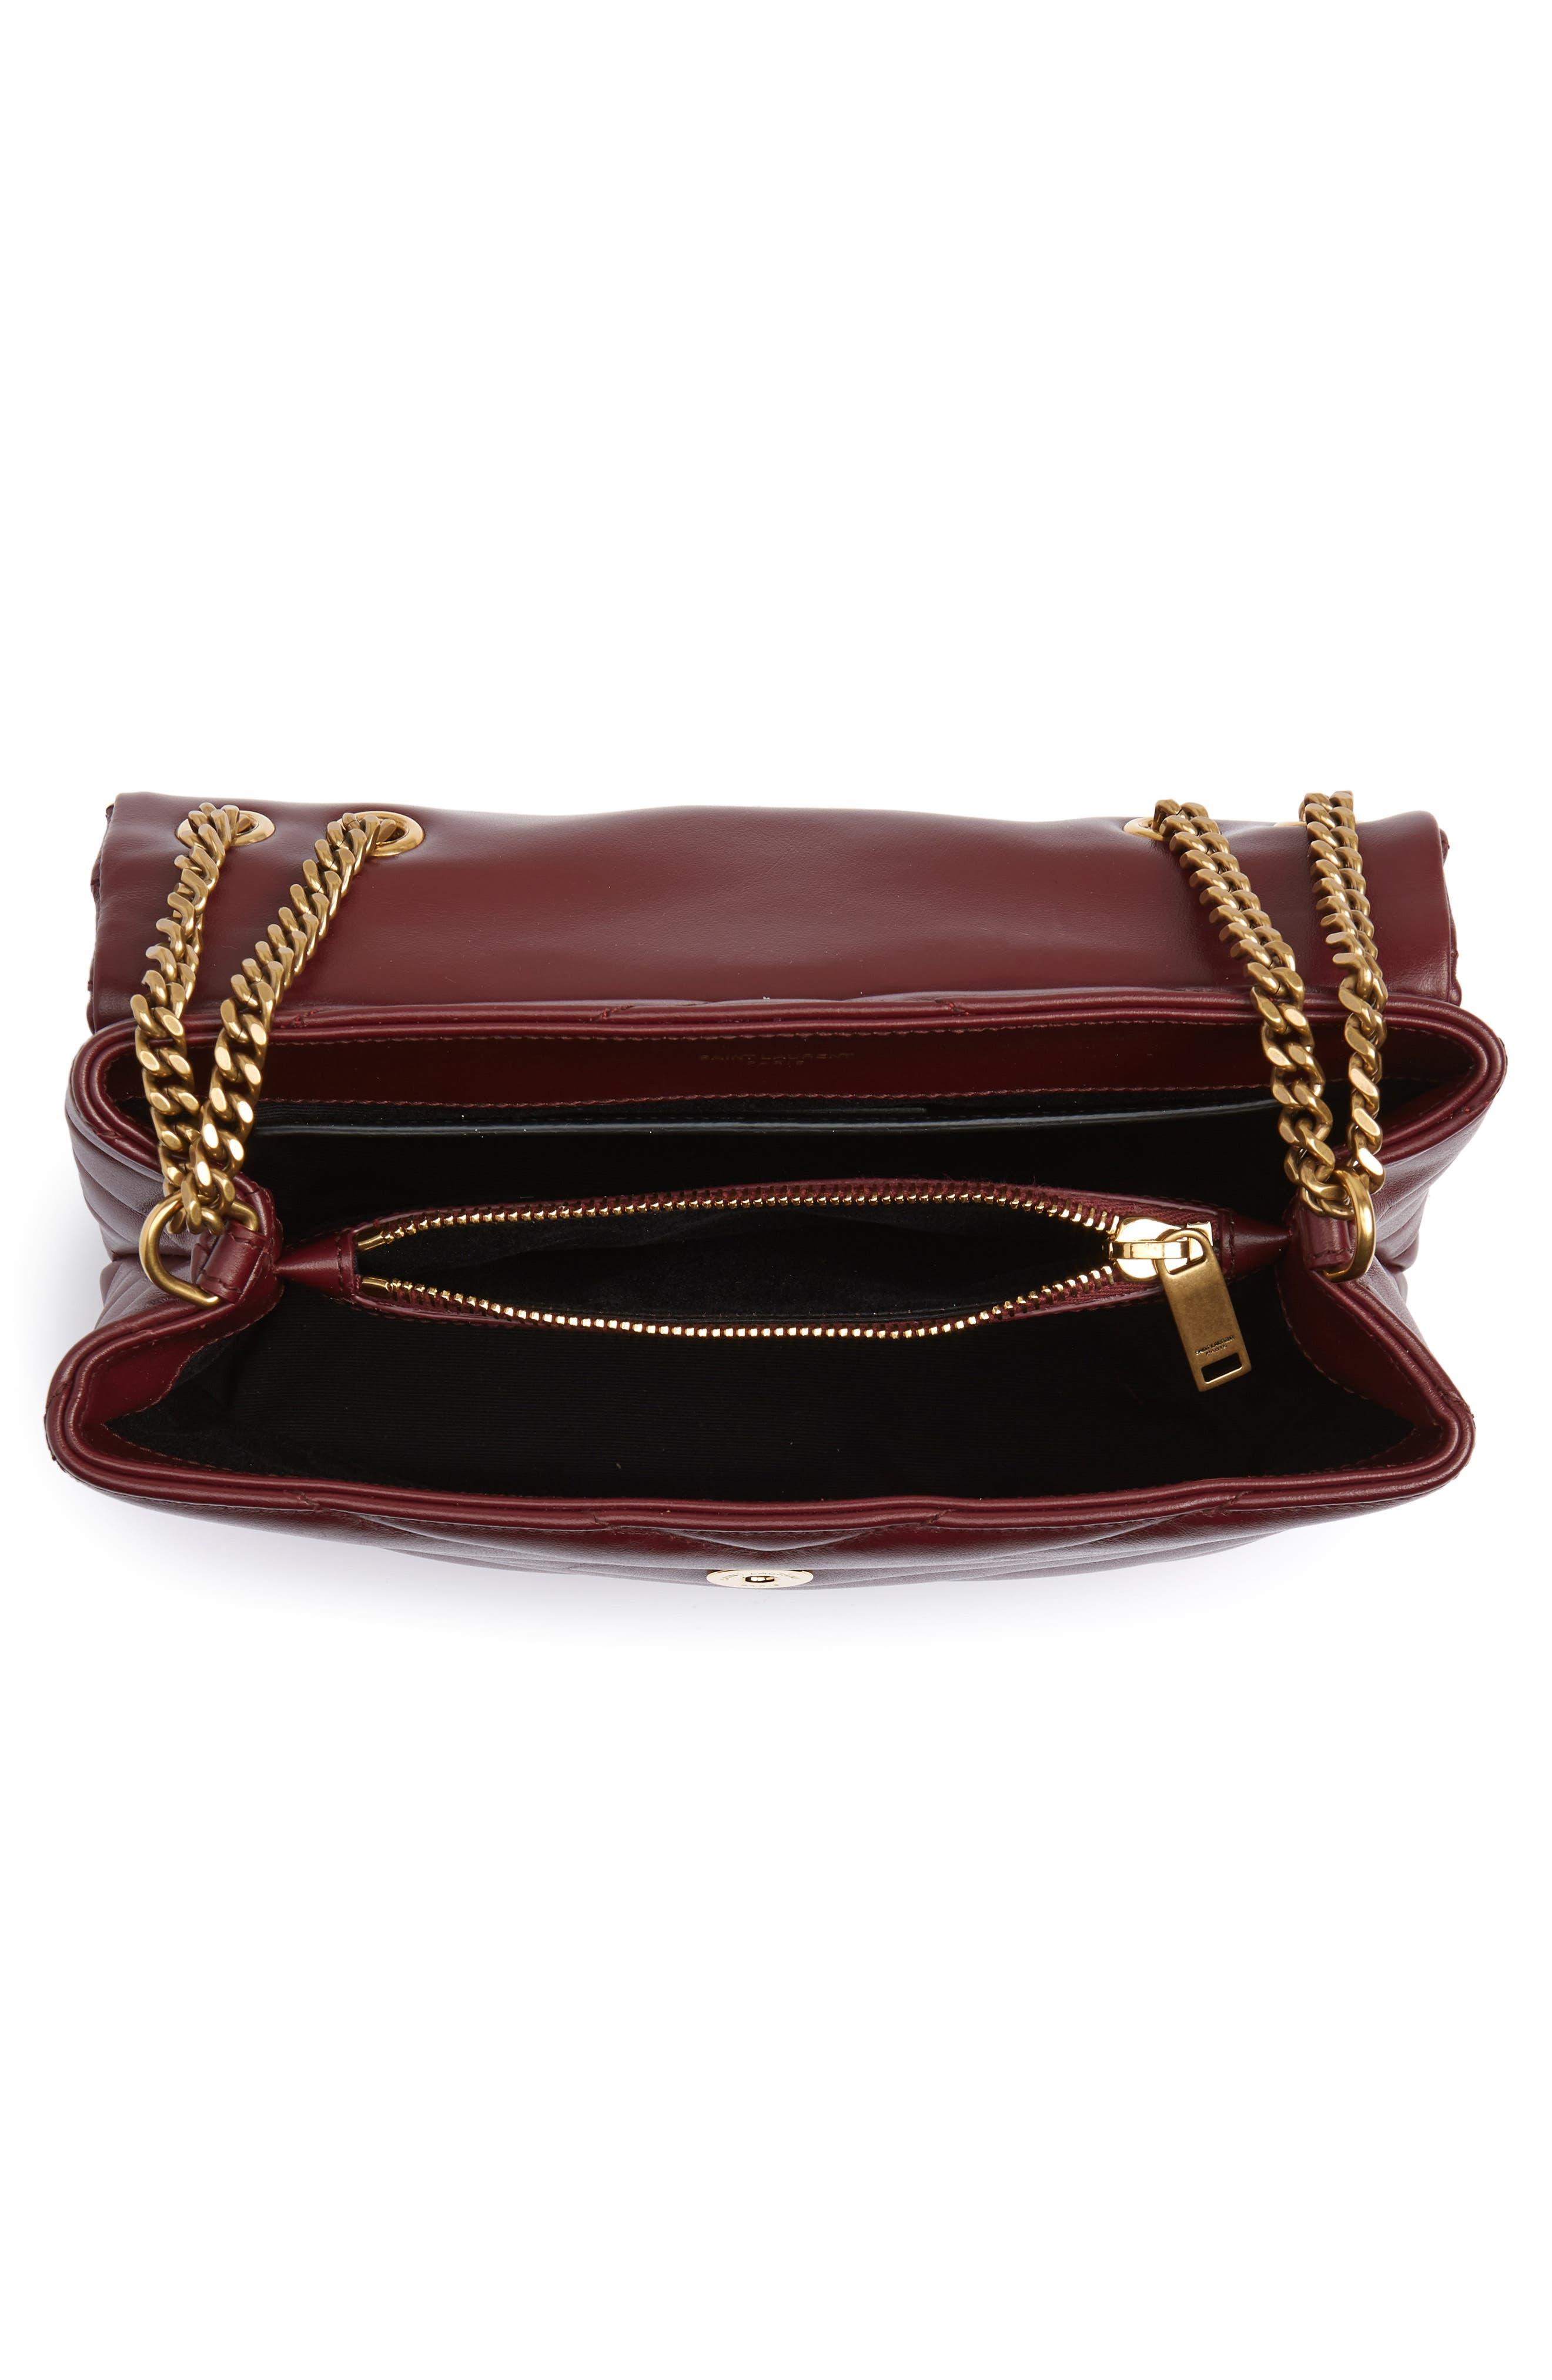 ,                             Small Loulou Leather Shoulder Bag,                             Alternate thumbnail 31, color,                             930